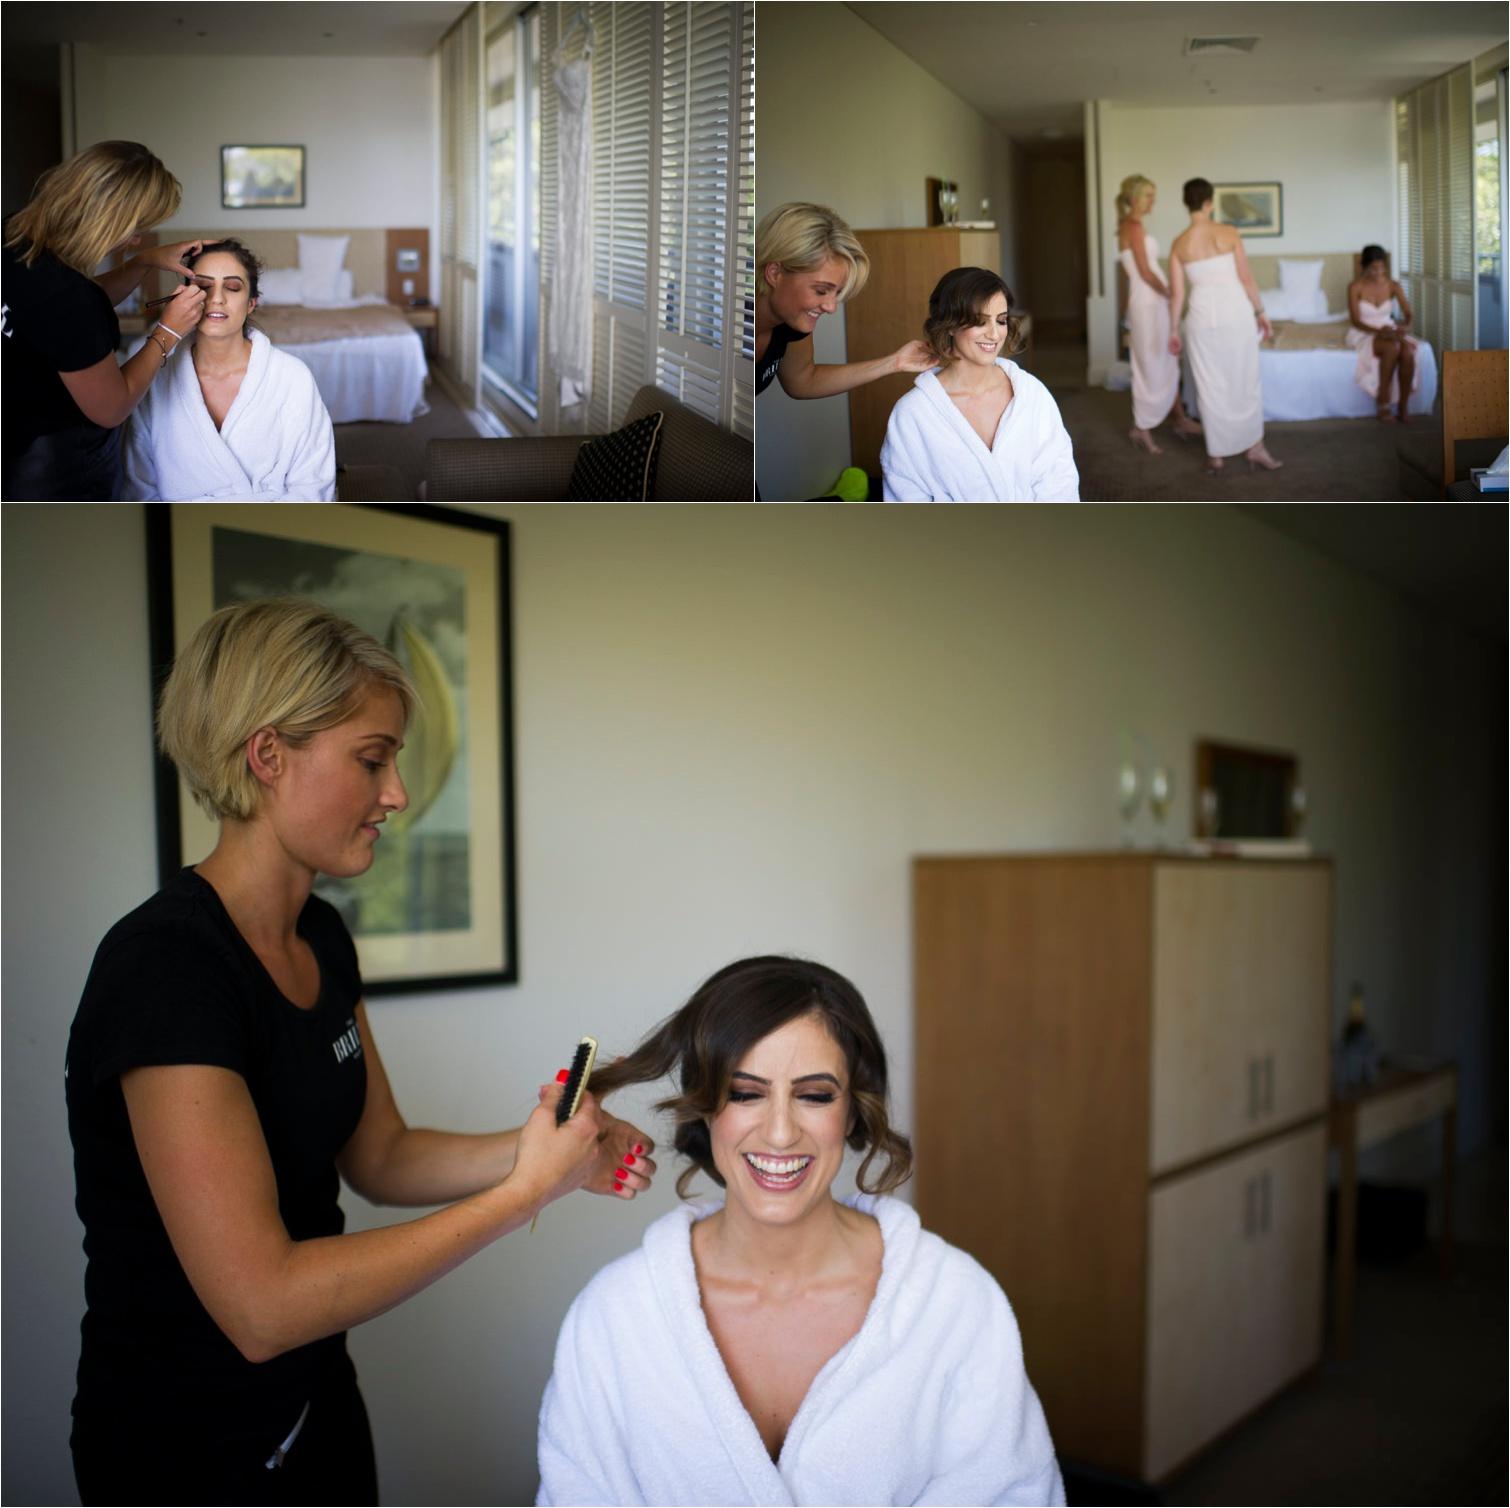 Nicole&Carlie_Watsons_Bay_Hotel_Wedding_by_Gold_Coast_Photographers-The_Follans2.jpg